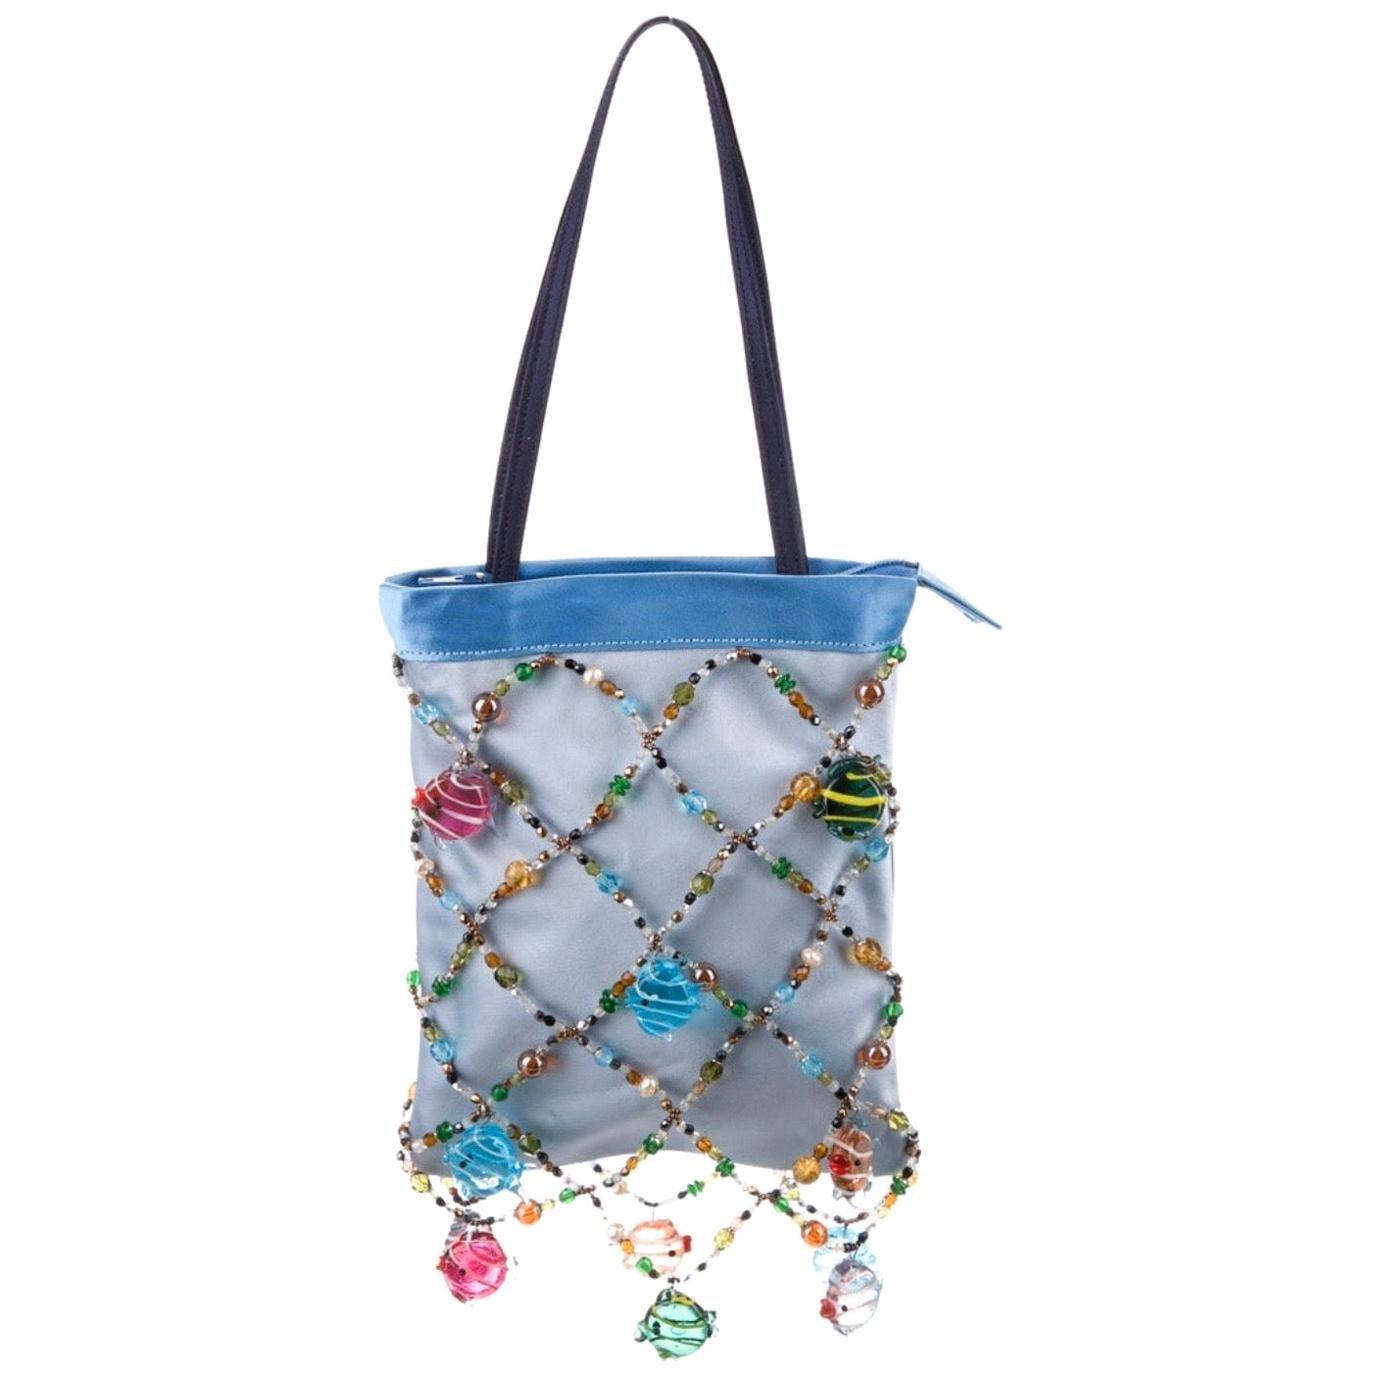 Renaud Pellegrino Blue Mini Silk Evening Bag with Glass Embellishments